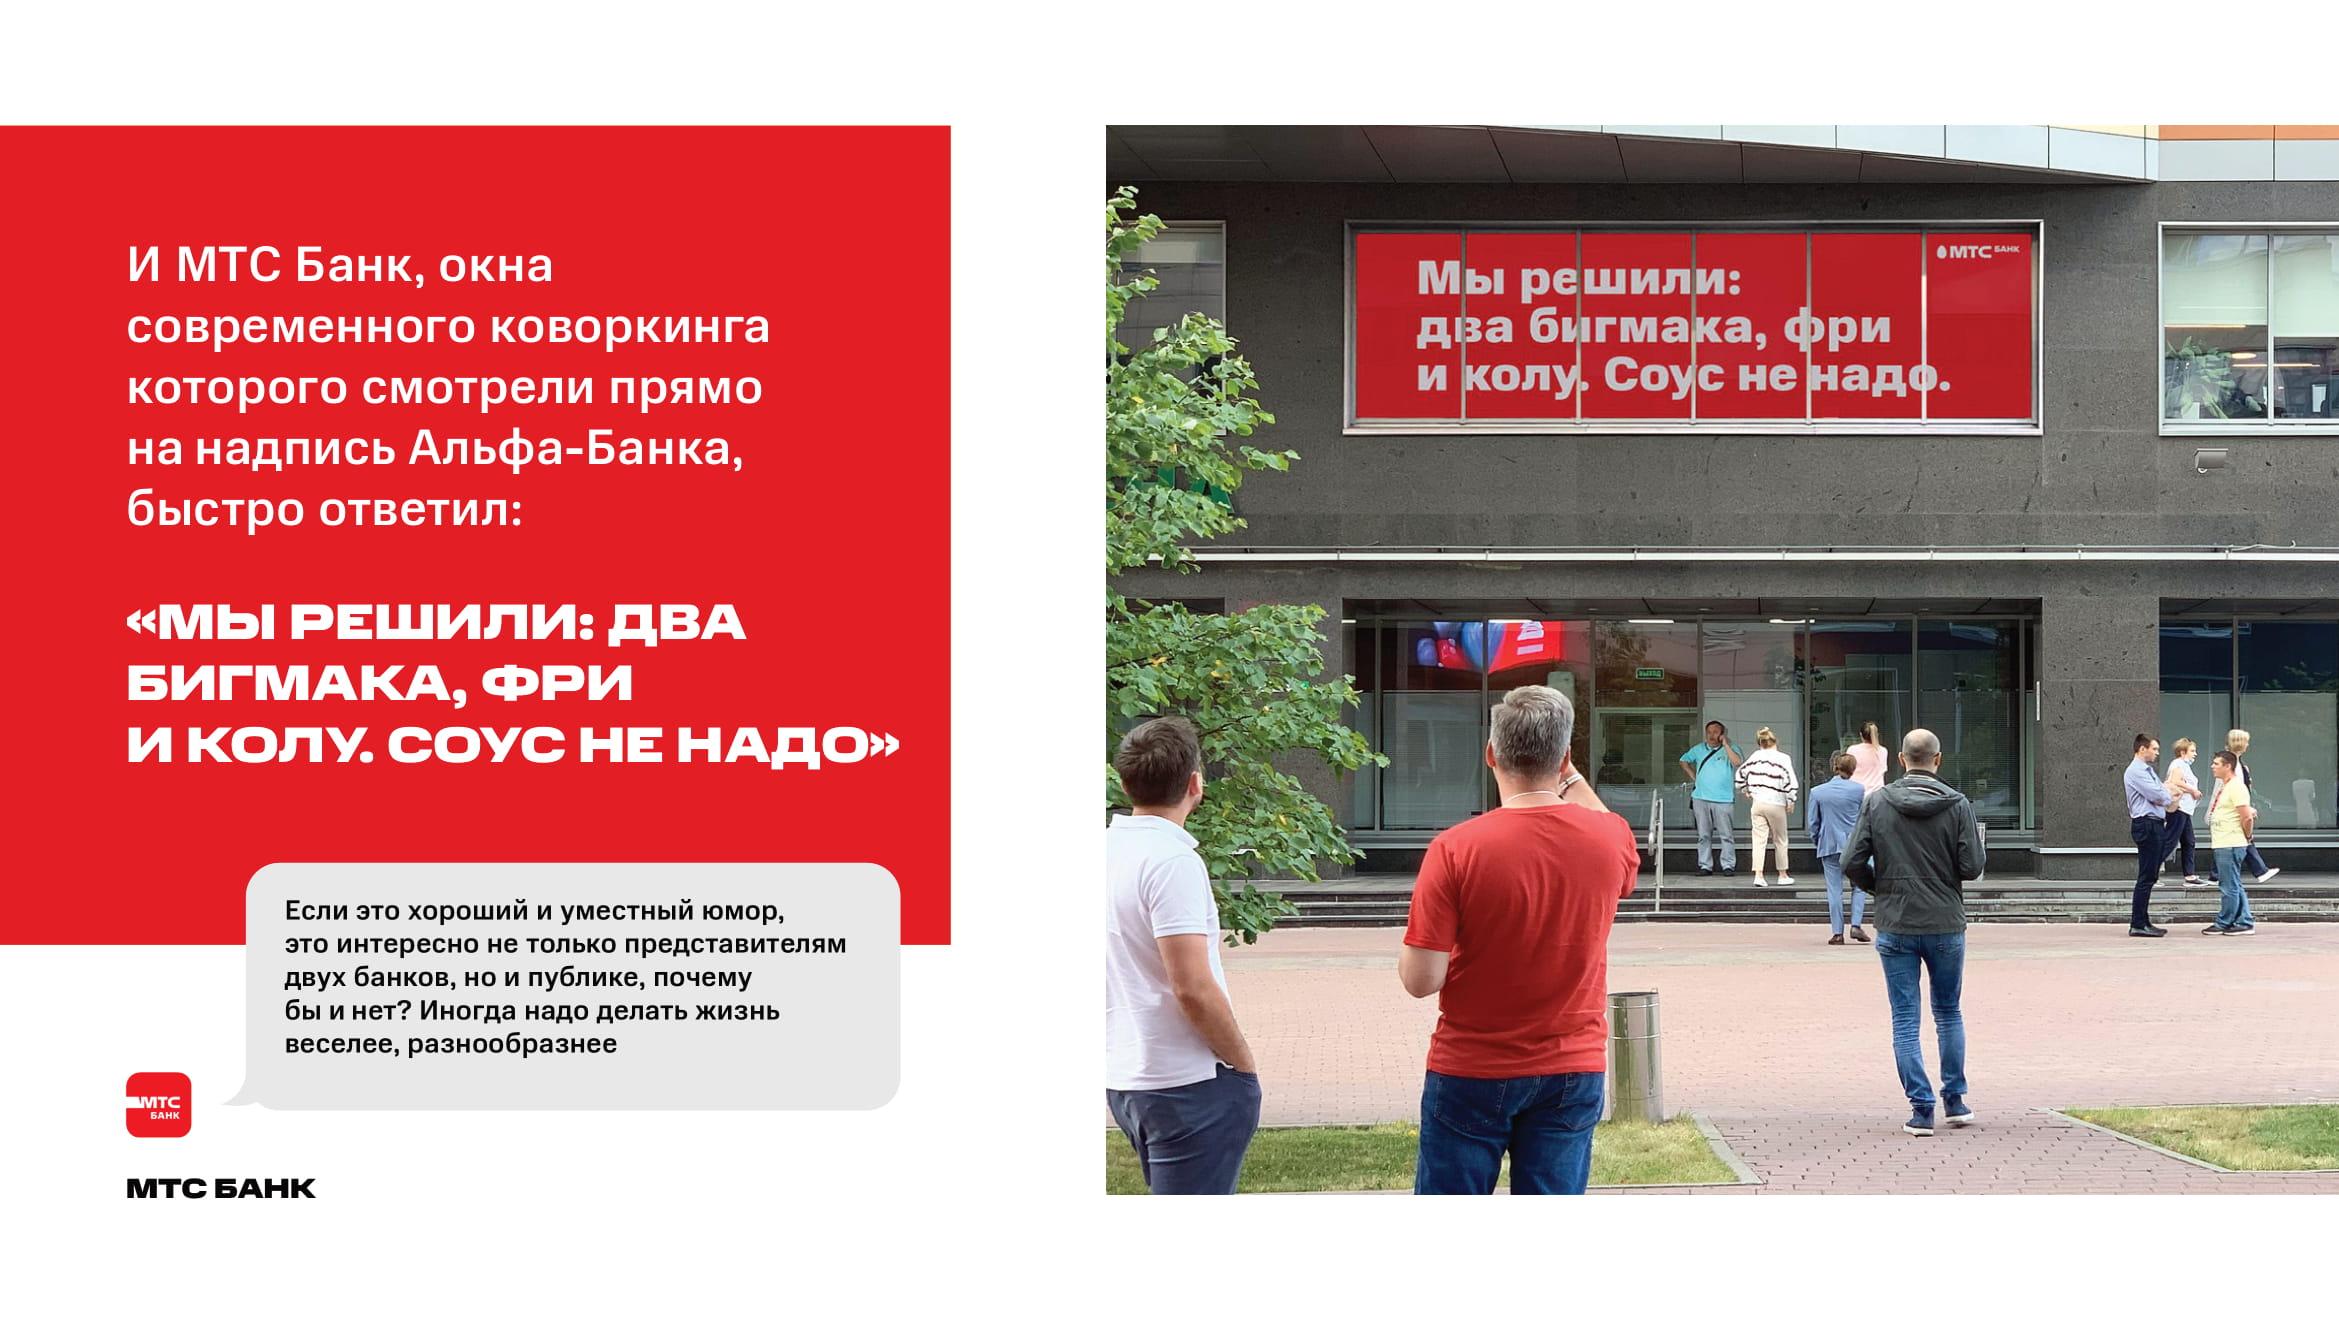 RFA_Креатив-года-2020_МТС-Банк-VS-Альфа-Банк-06